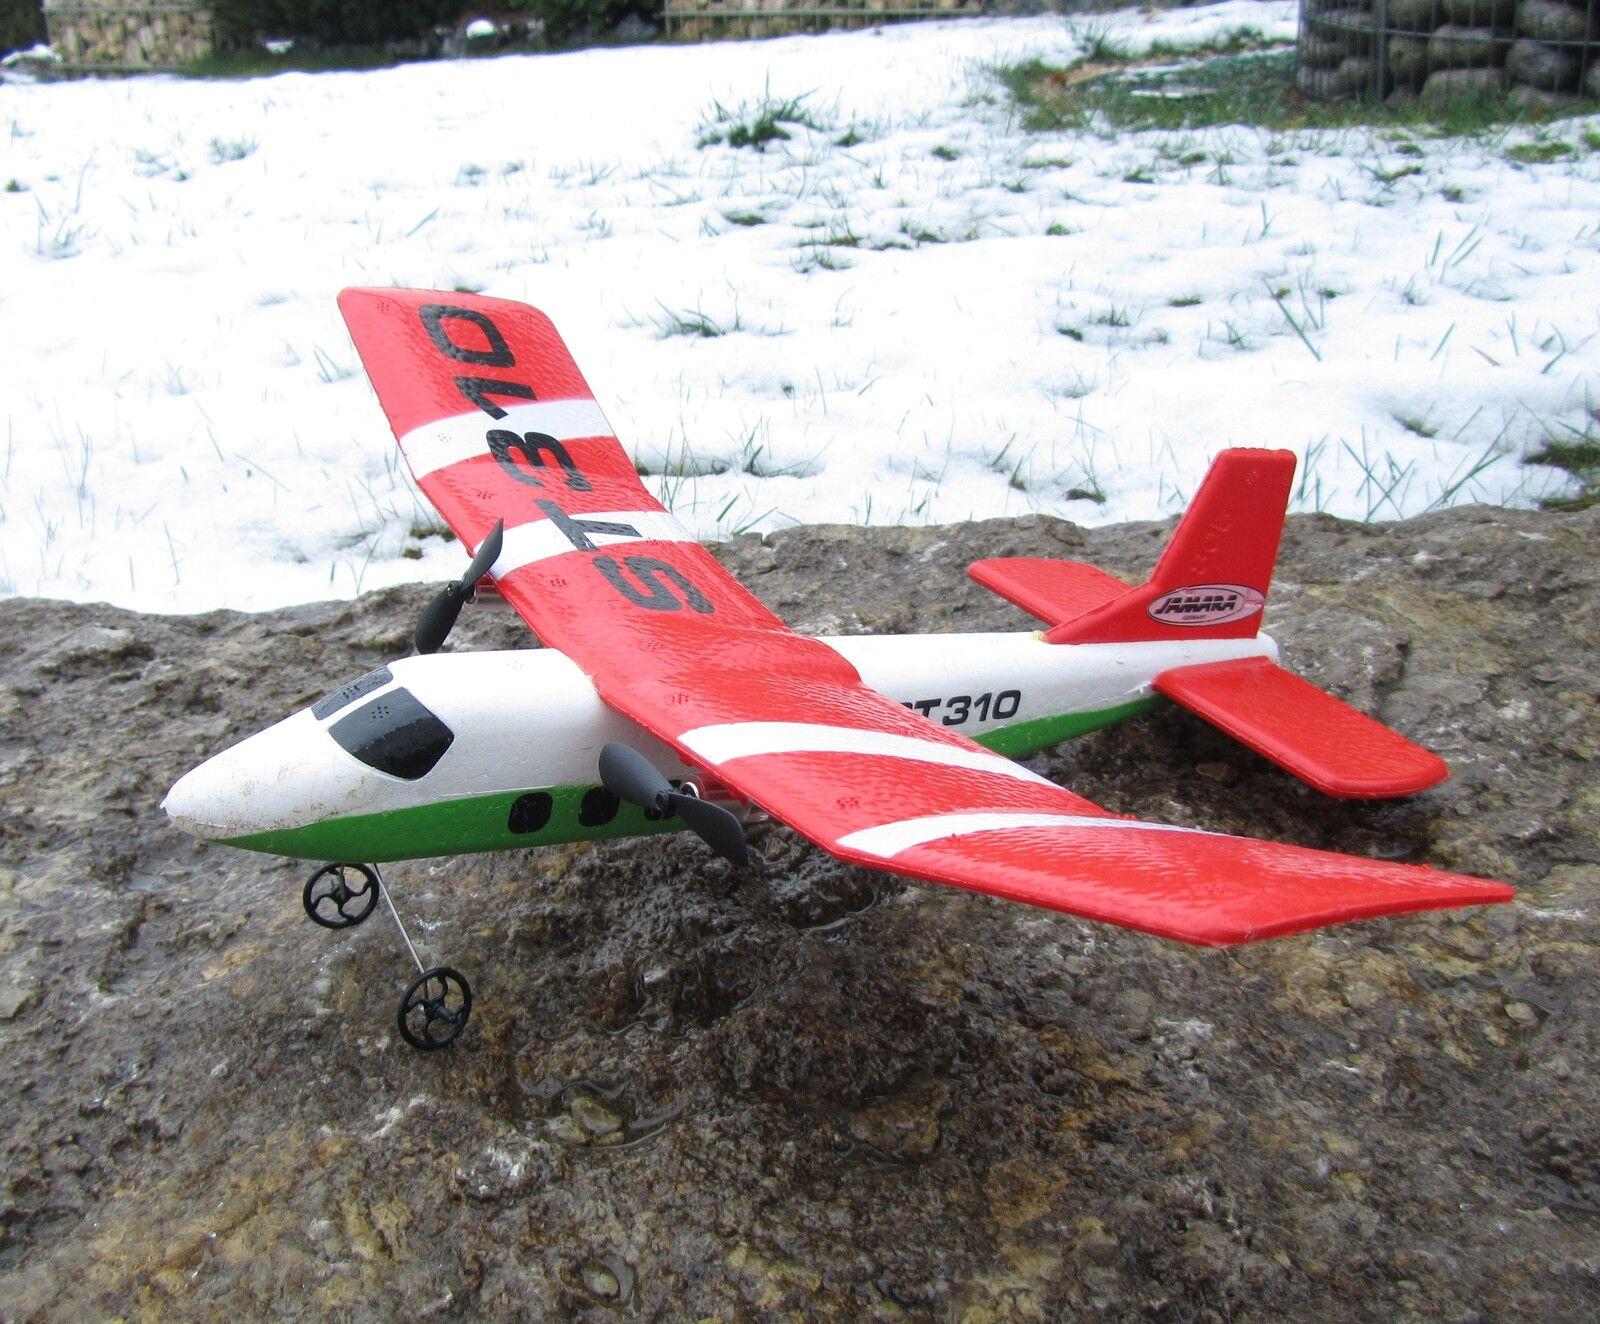 RC Flugzeug ST310 Ferngesteuert Lipo Akku 2CH 2.4 GHZ   012300